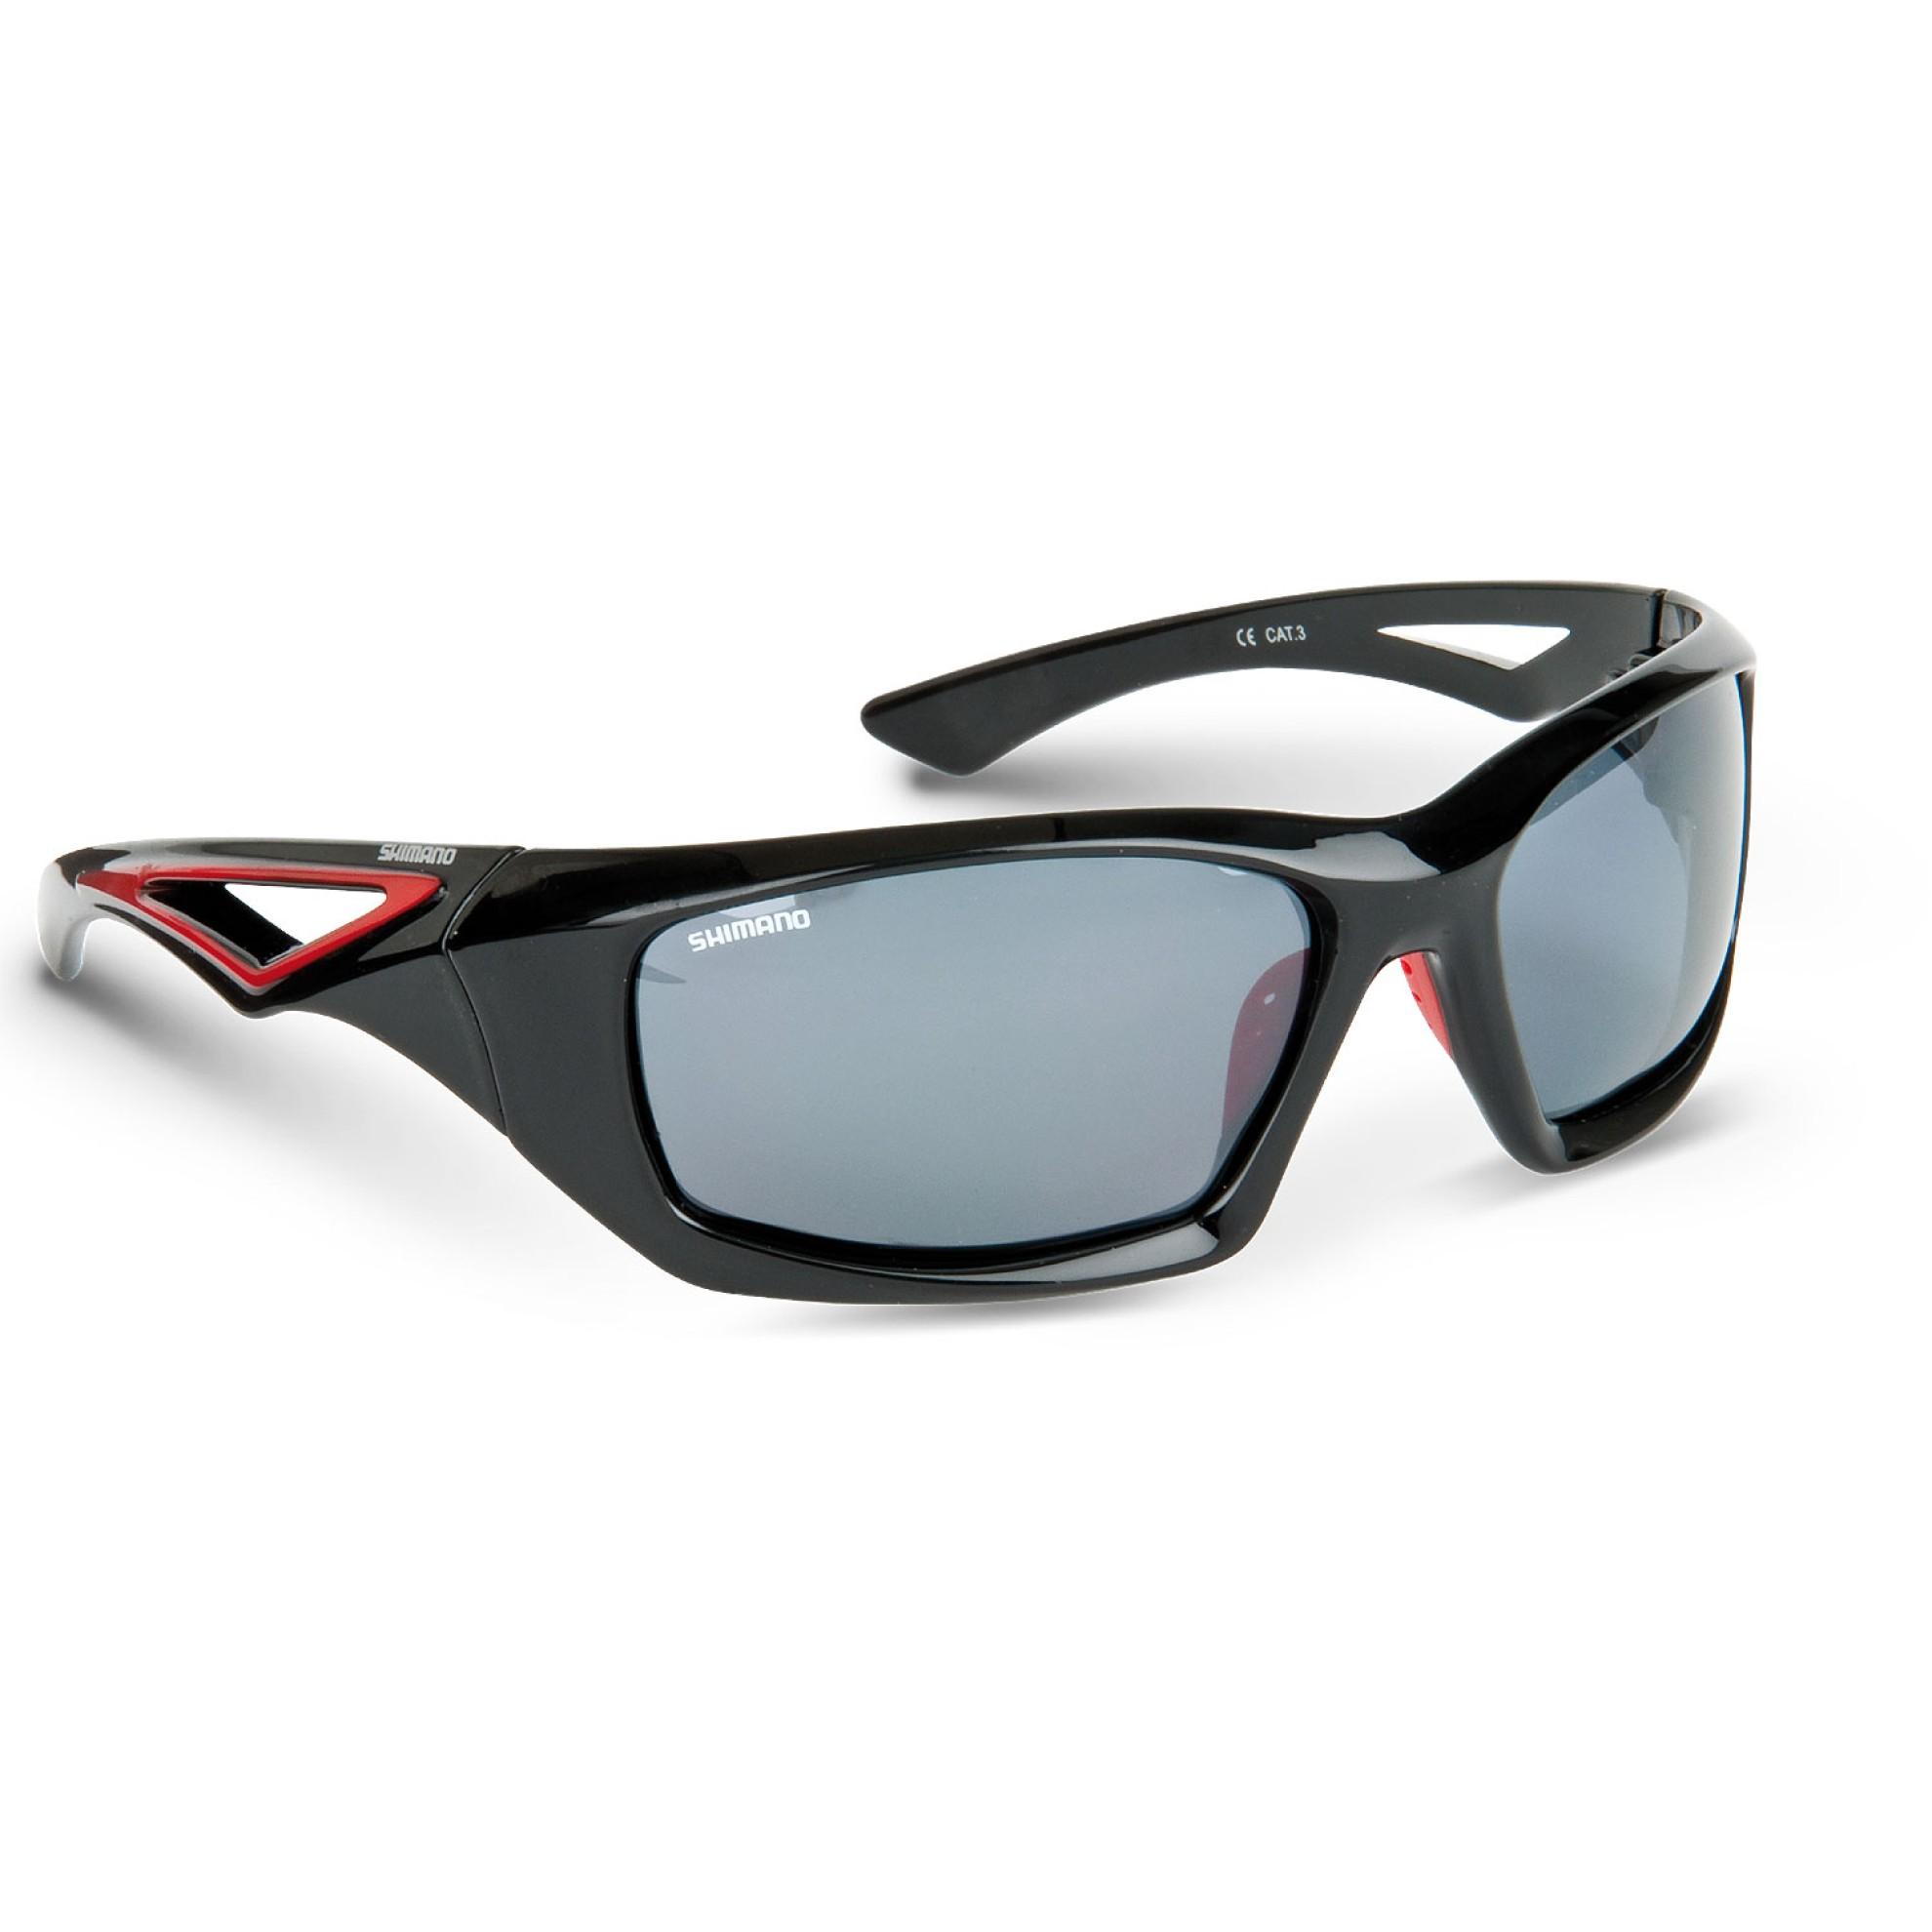 bb0258c5238 SHIMANO Aernos Polarized Sunglasses